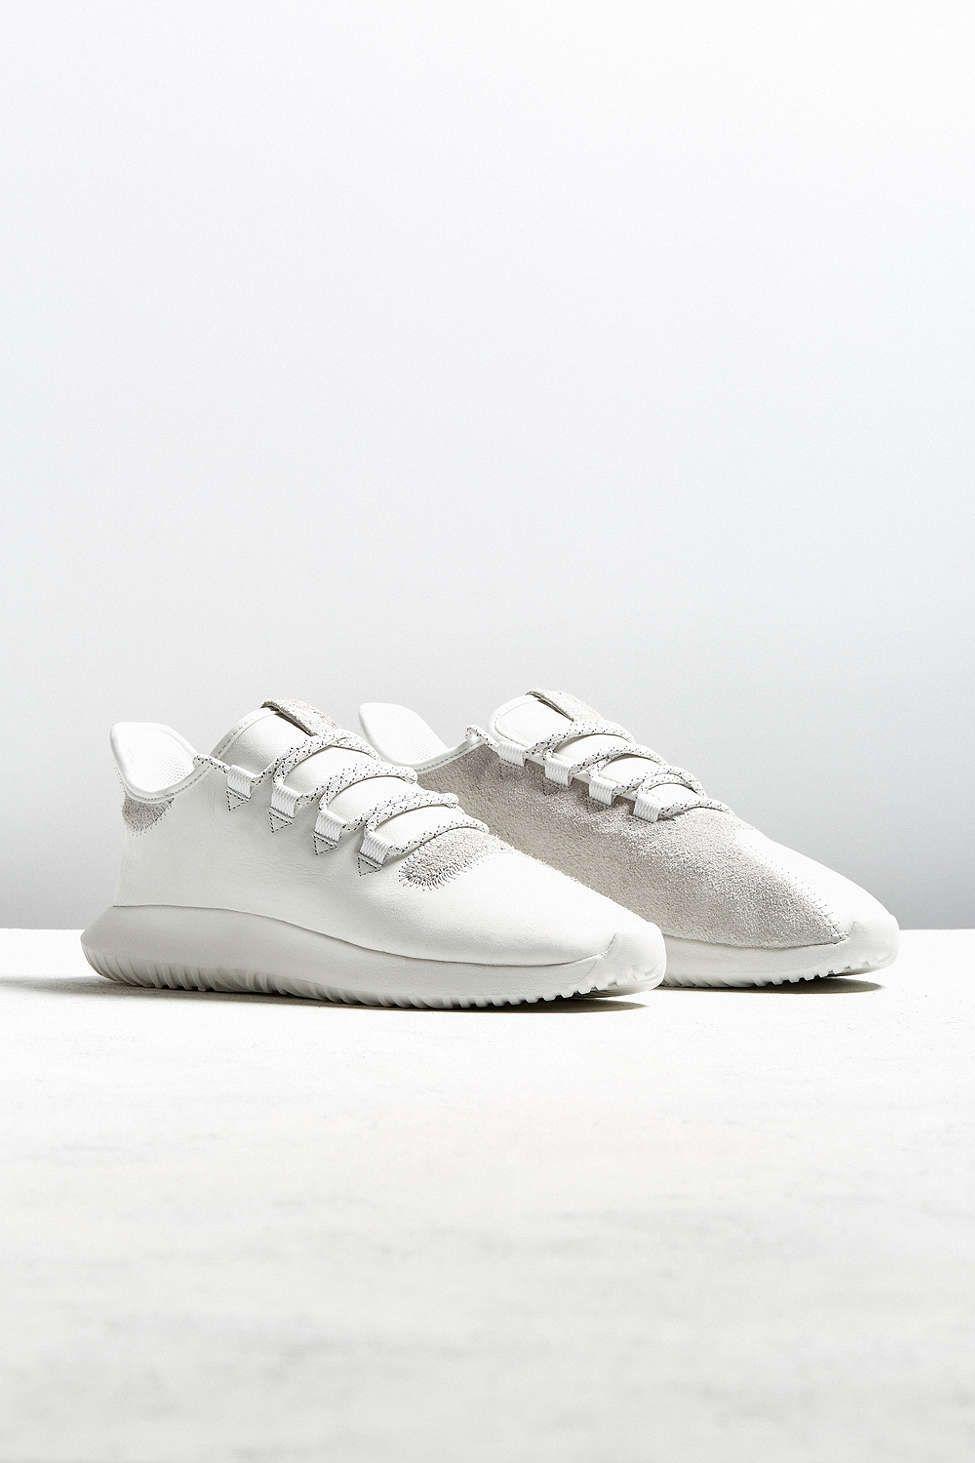 adidas tubulare ombra scarpe adidas, ultimo styles e urbano